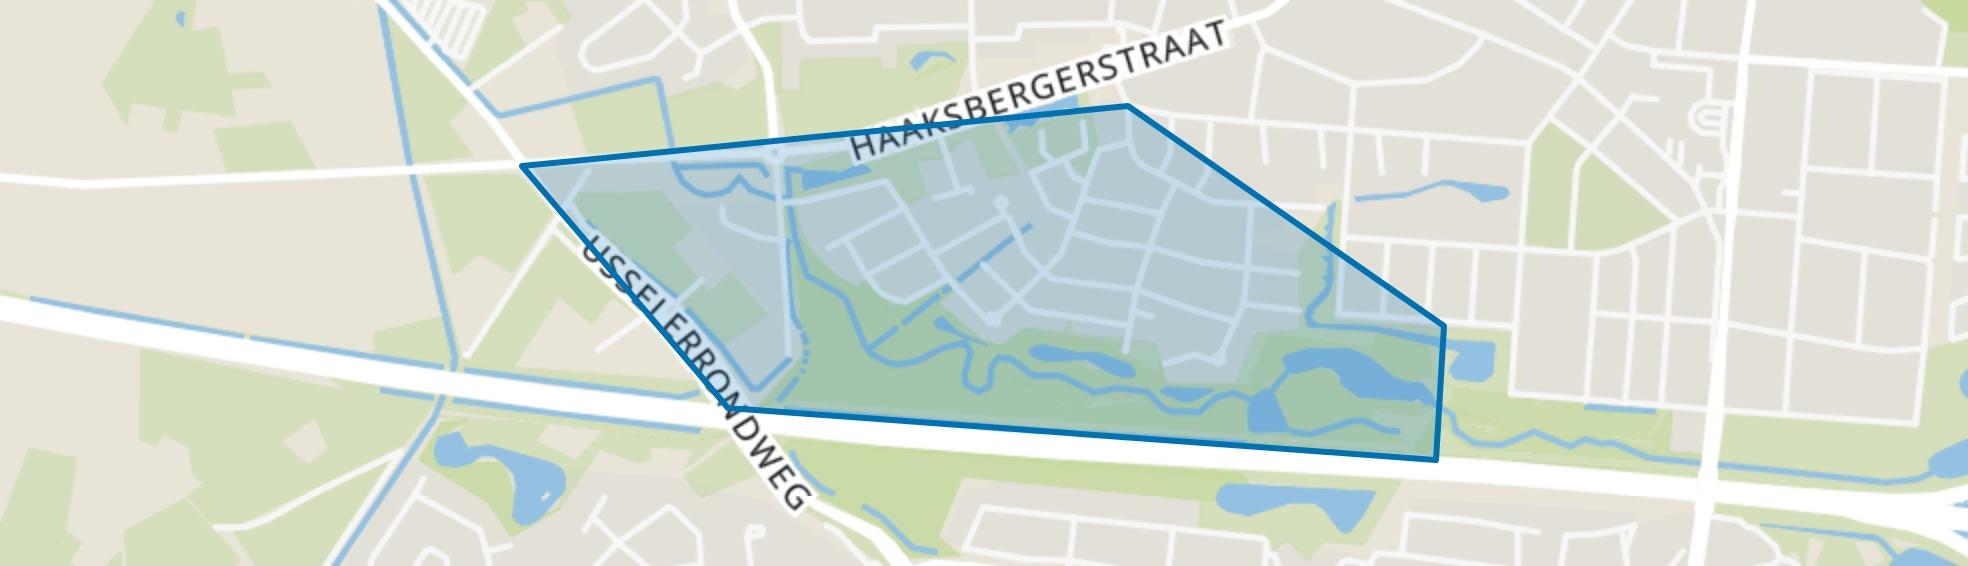 Ruwenbos, Enschede map